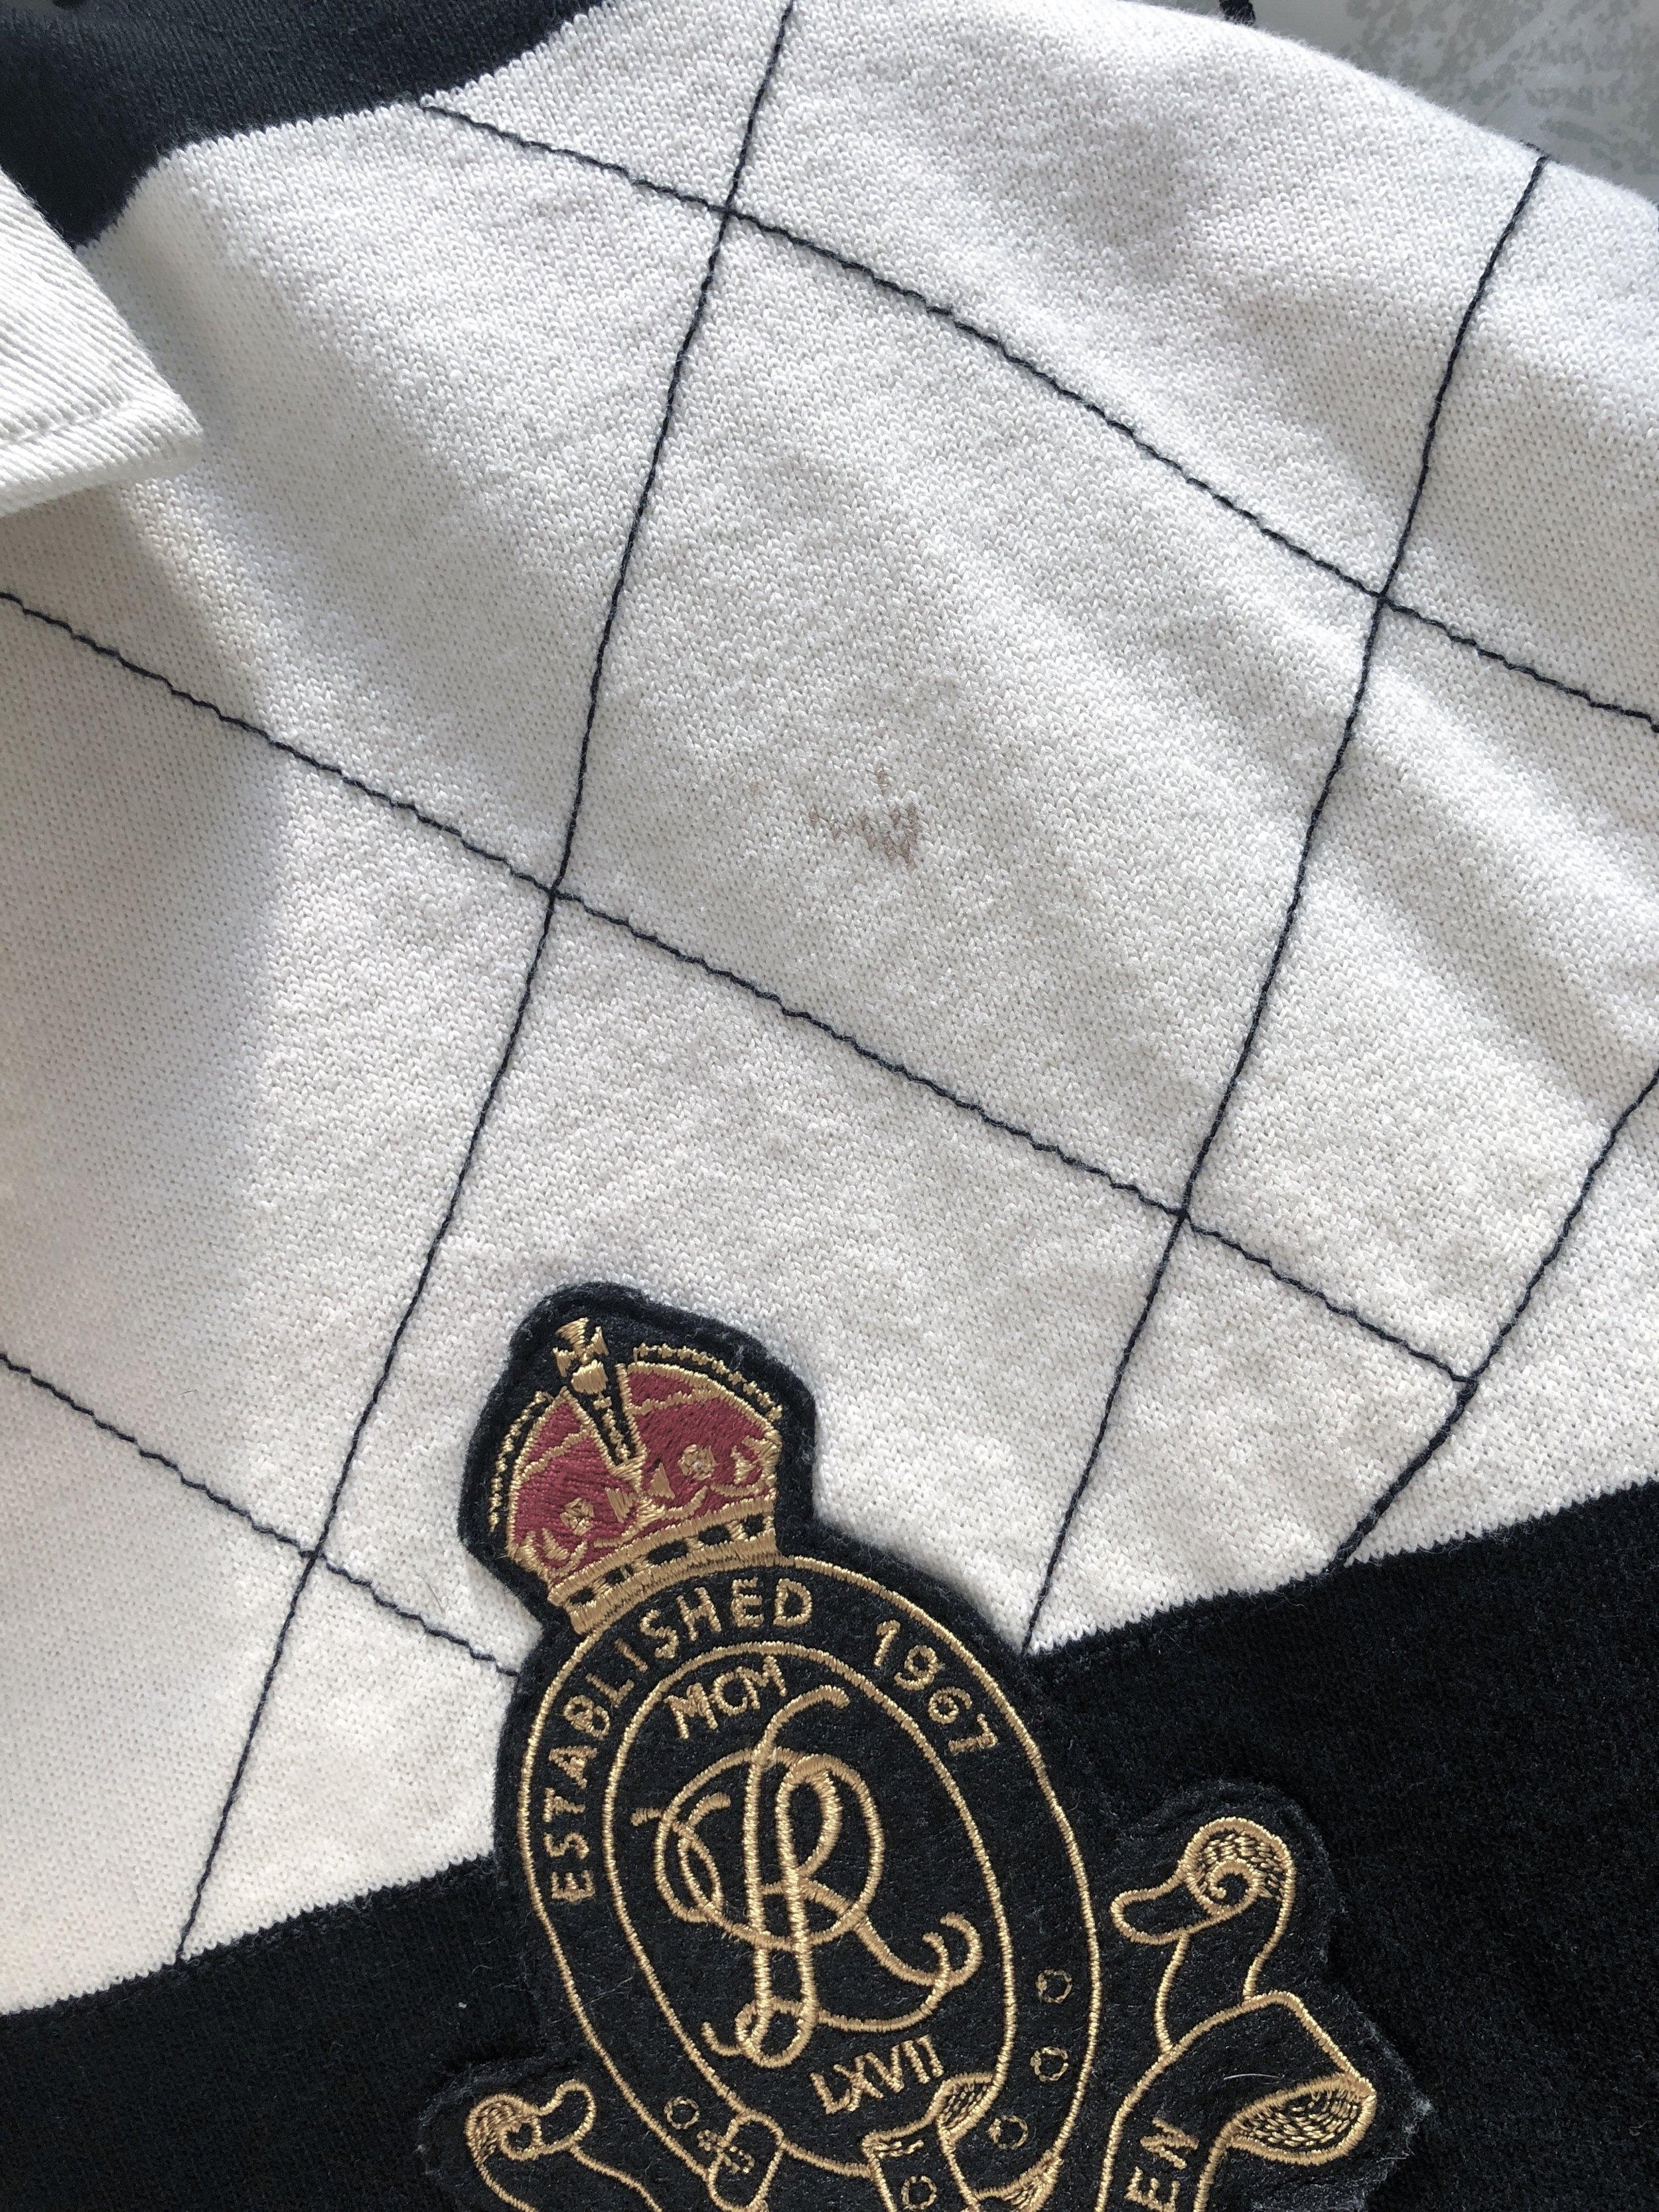 2a036e505 L - Ralph Lauren Block Stripe Rubgy Shirt — THE CONSISTENCY PROJECT